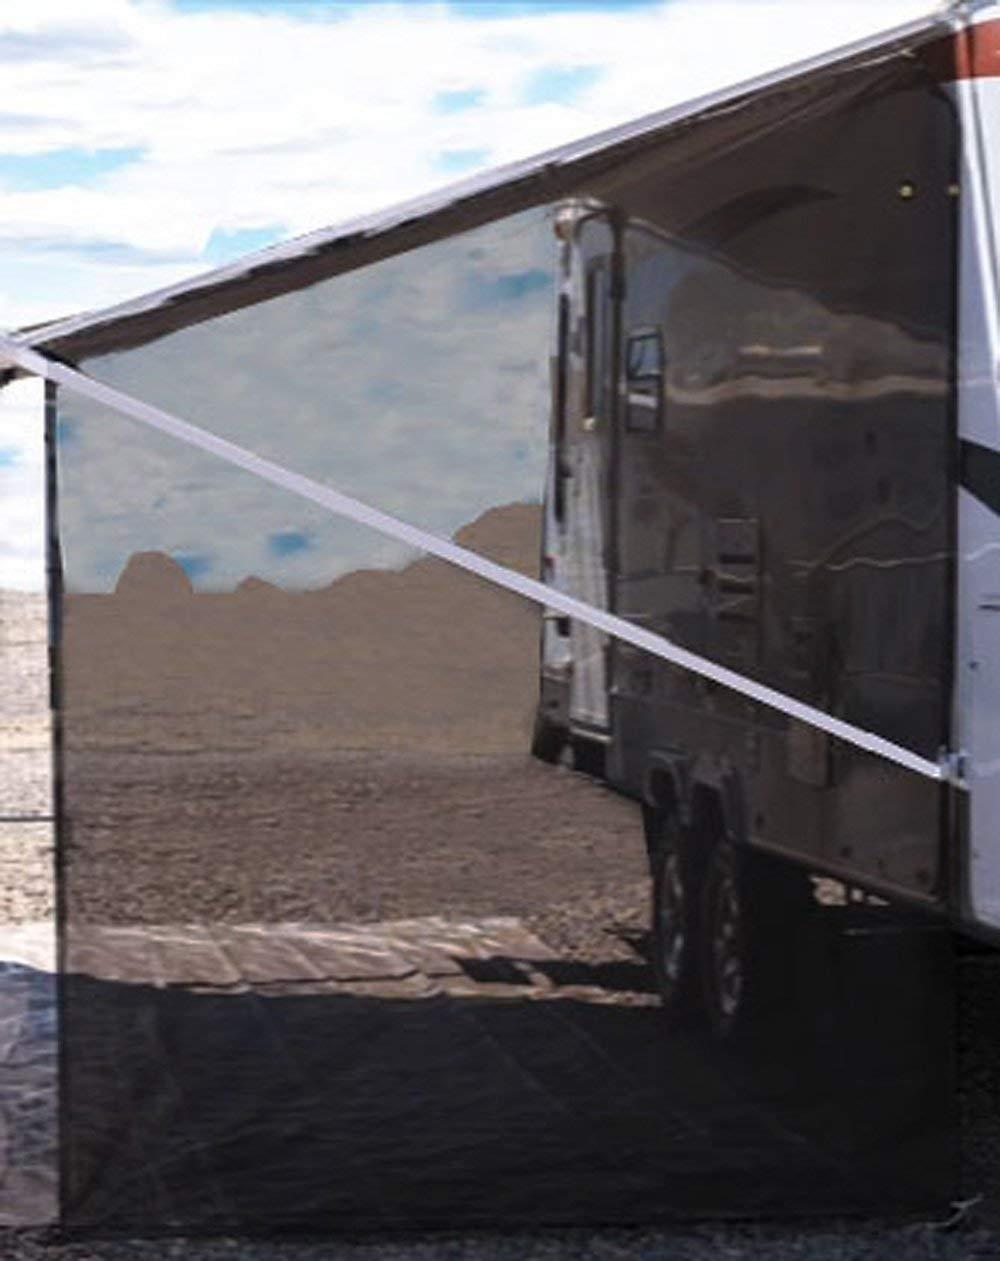 Tentproinc RV Awning Side Shade 9 X7 – Black Mesh Screen Sunshade Complete Kits Camping Trailer Canopy UV Sun Blocker – 3 Years Limited Warranty